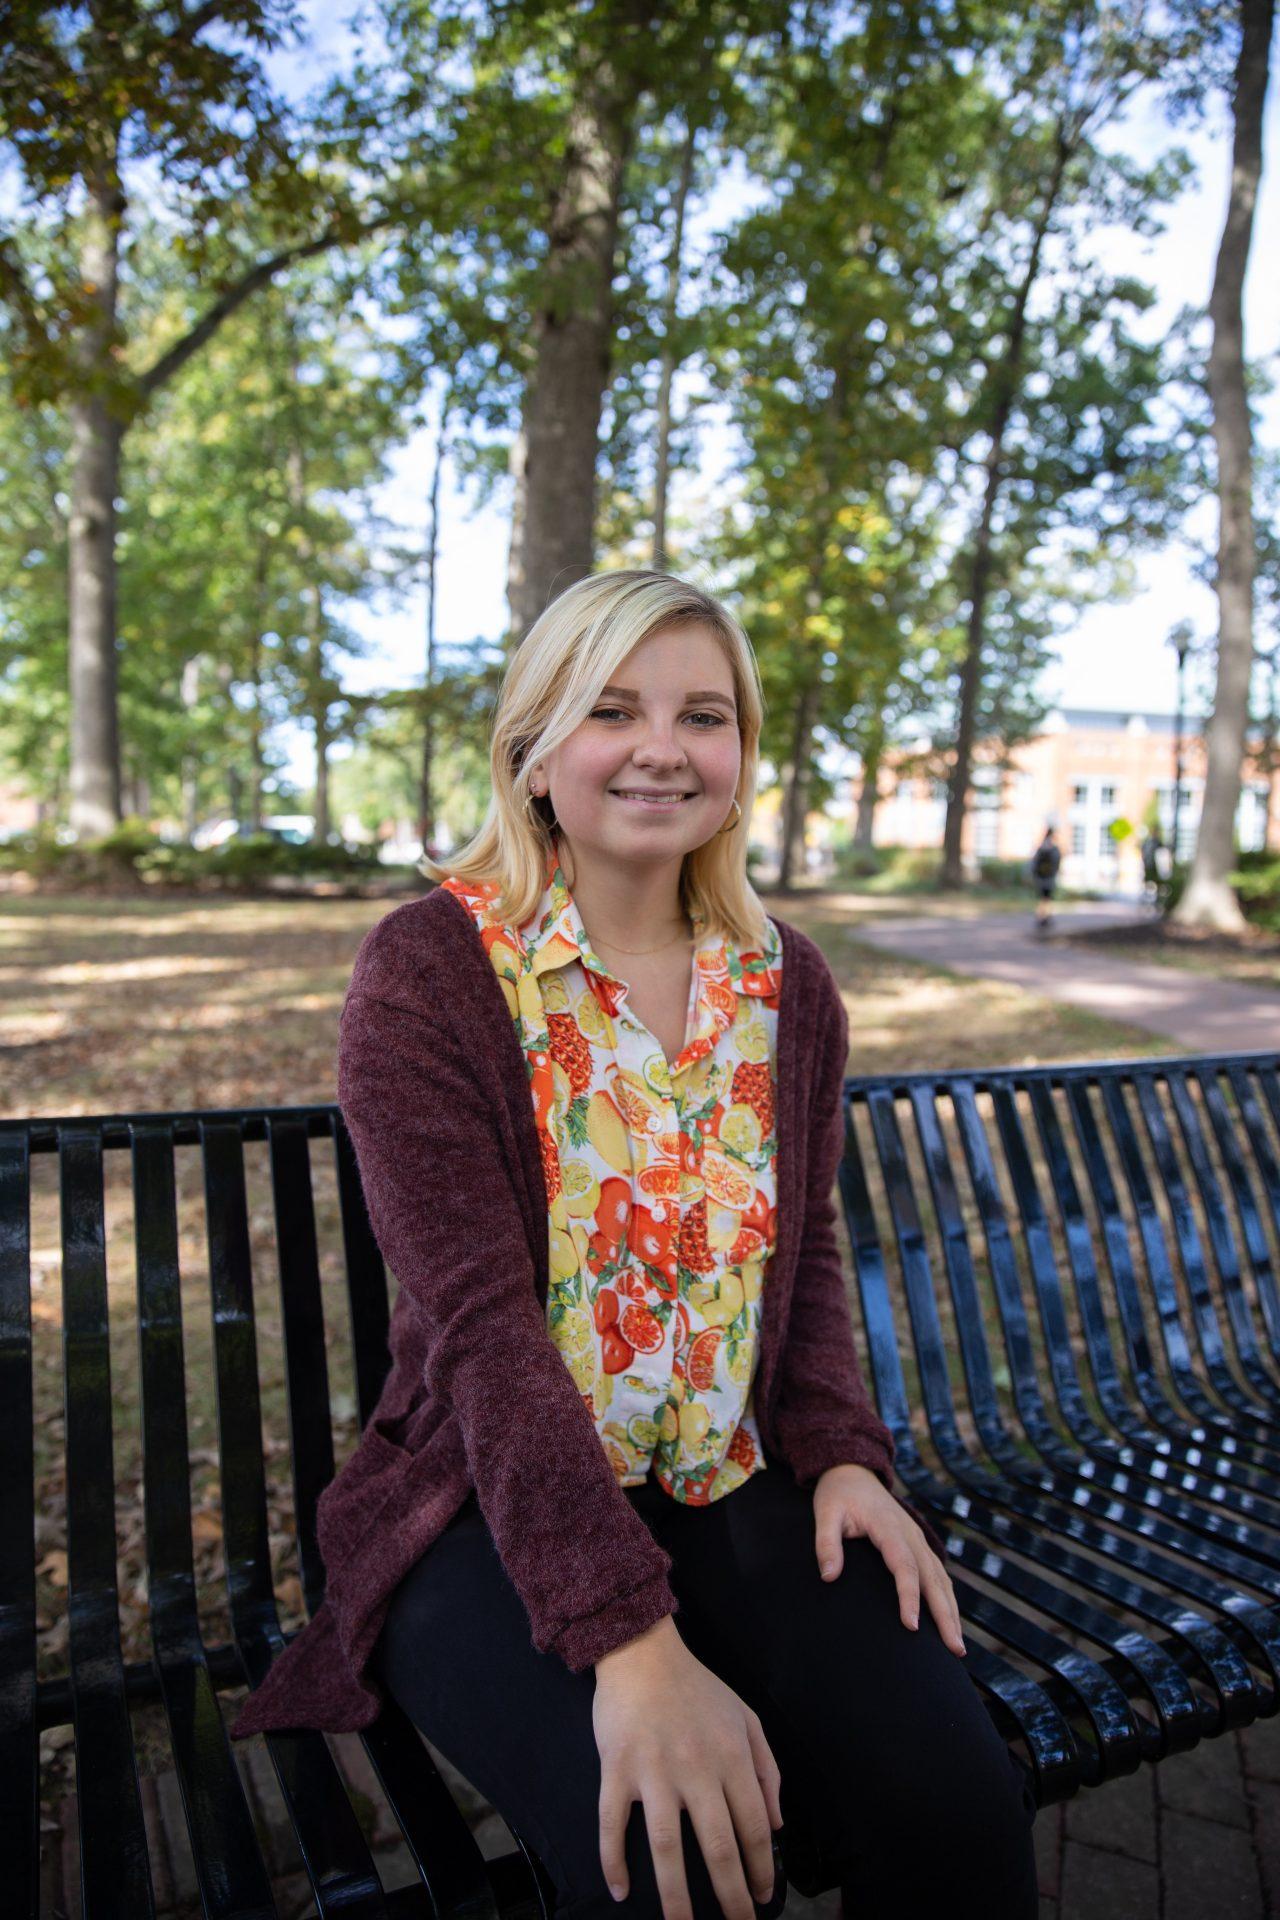 Grace Van Cleef posing on a bench on Rowan University's campus.